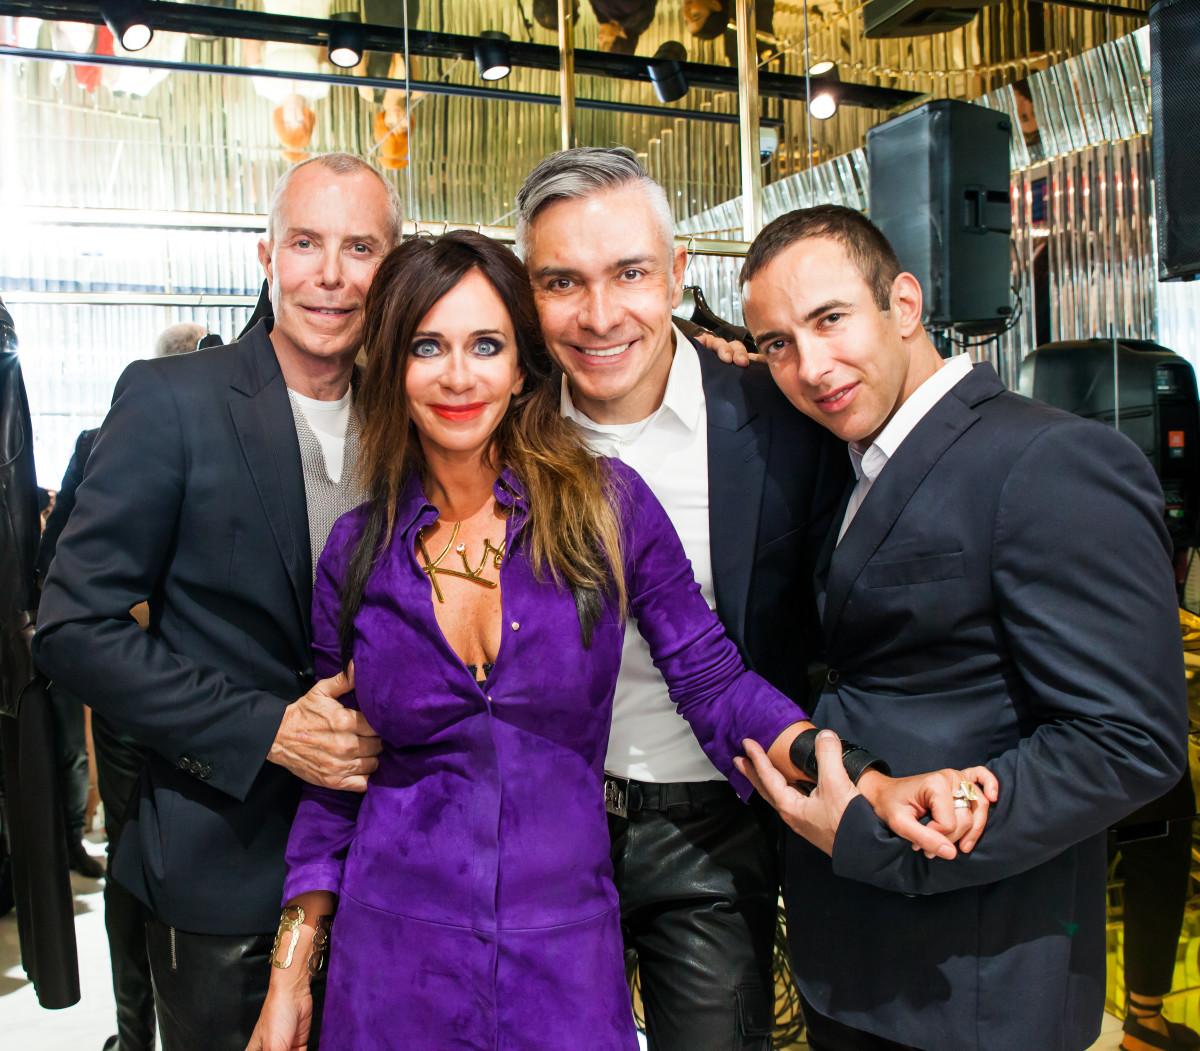 Jean-Claude Jitrois, Jodi Shelton, Gilbert Maria and Yann Patry. Photo: Jitrois